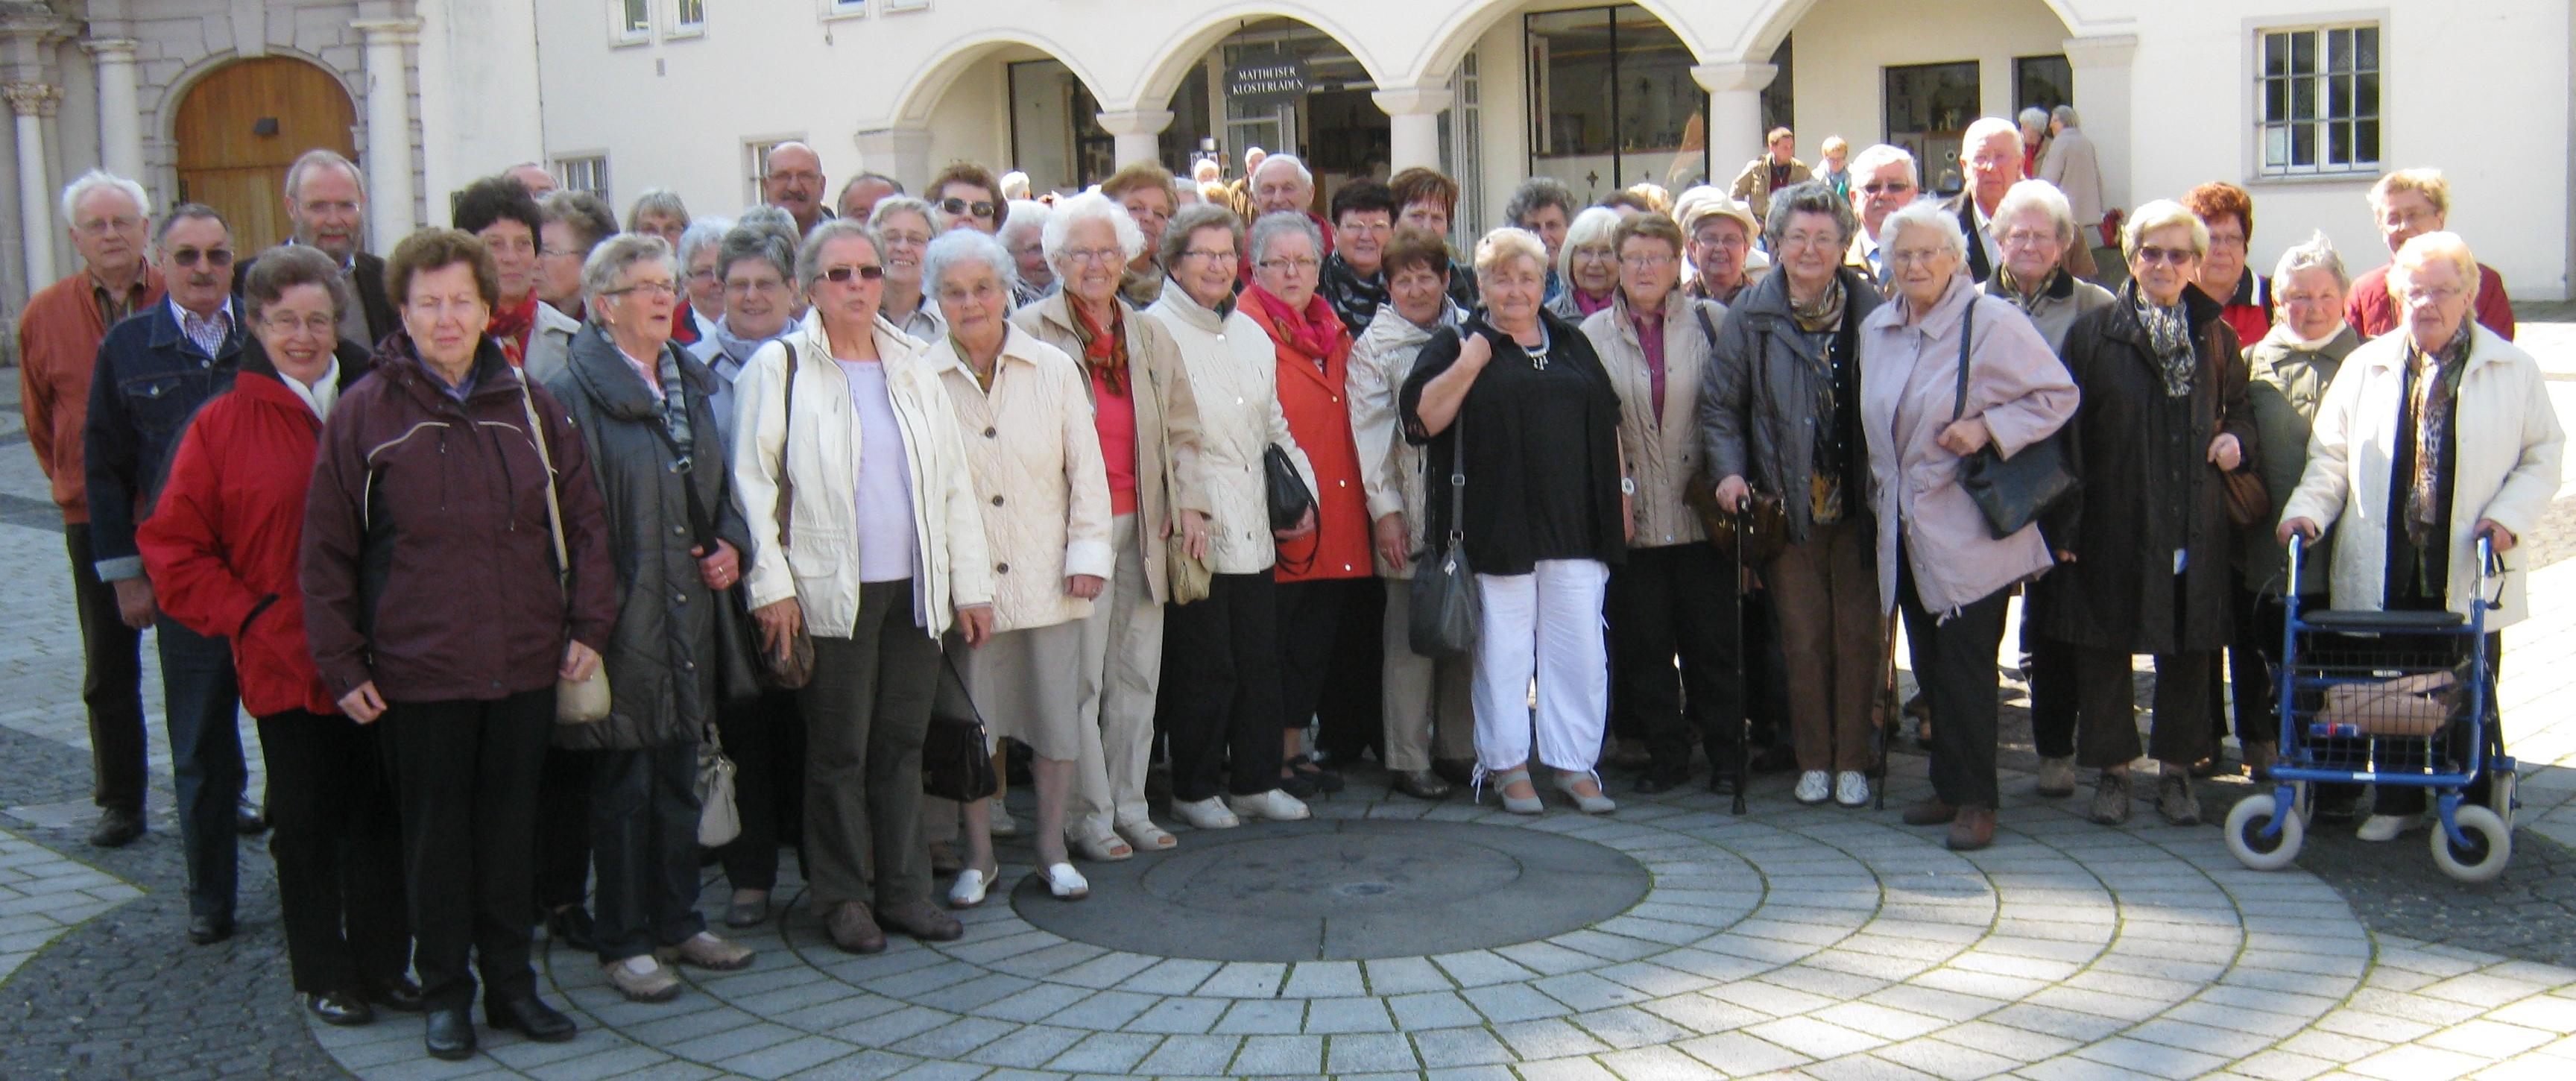 Trierwallfahrt der St. Matthias – Bruderschaft am 25. Mai